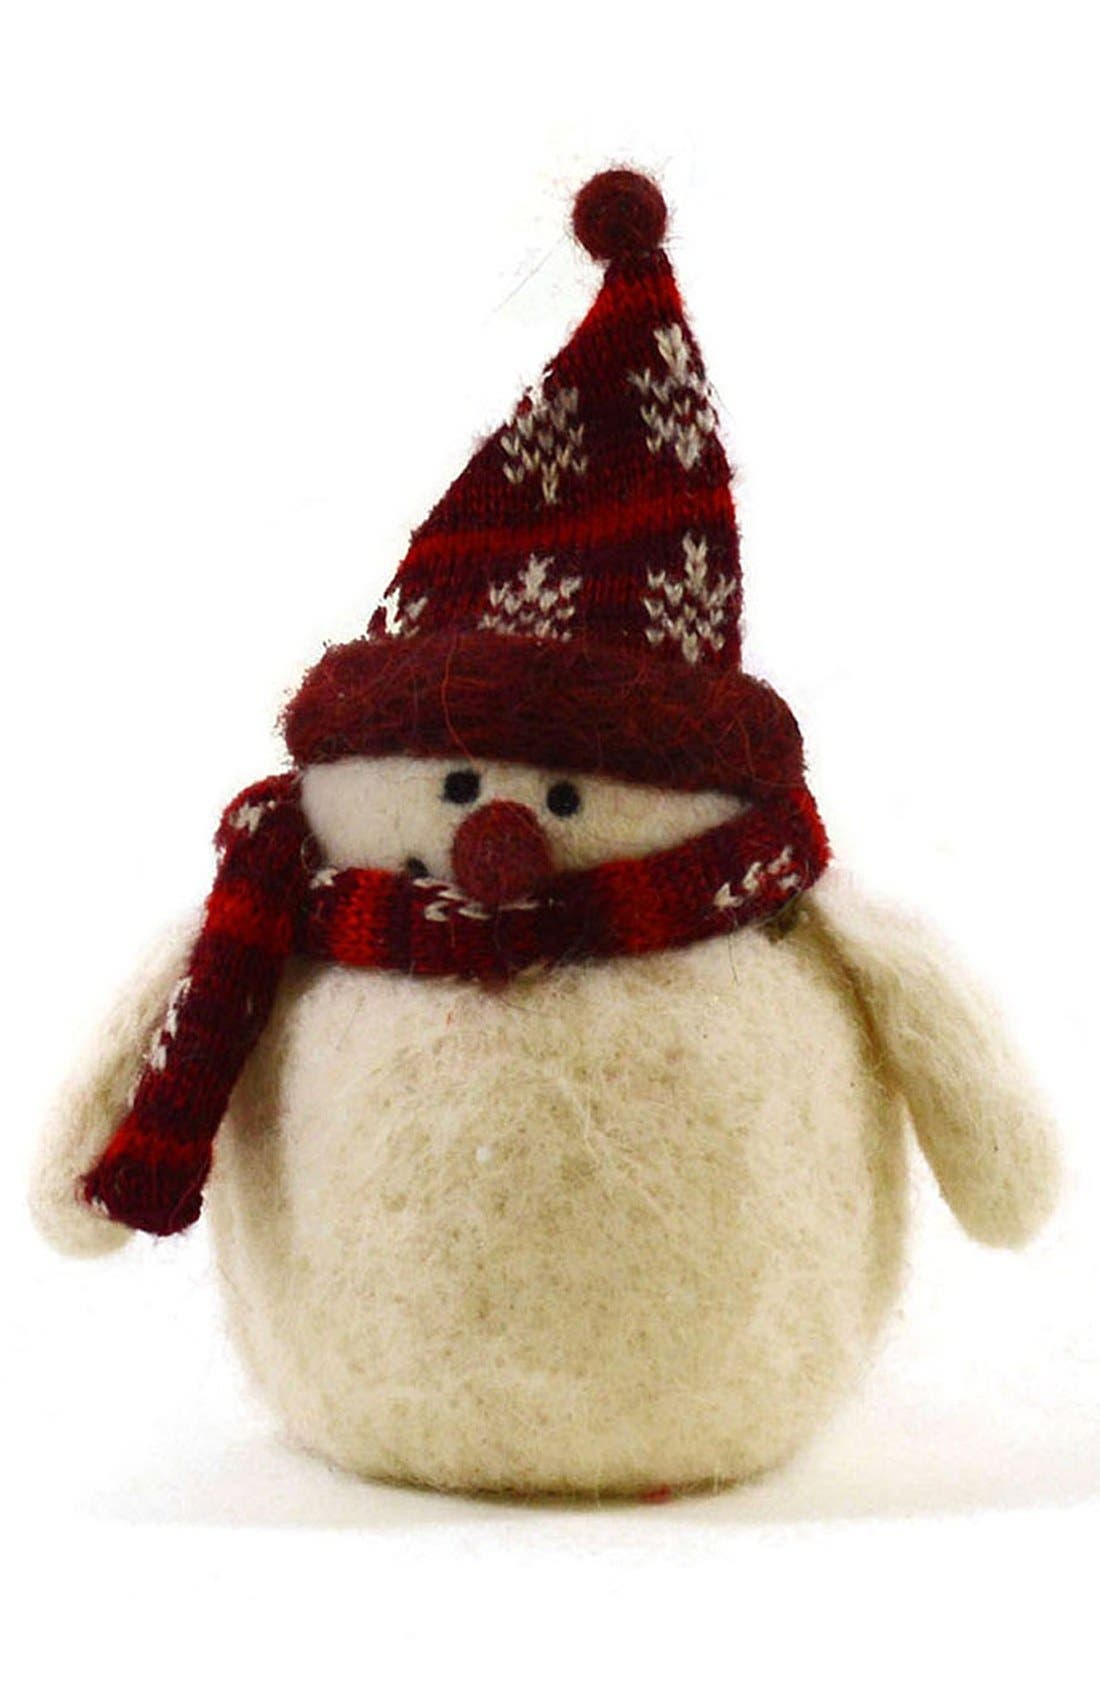 Alternate Image 1 Selected - Shea's Wildflower 'Hadley the Snowman' Wool Figurine